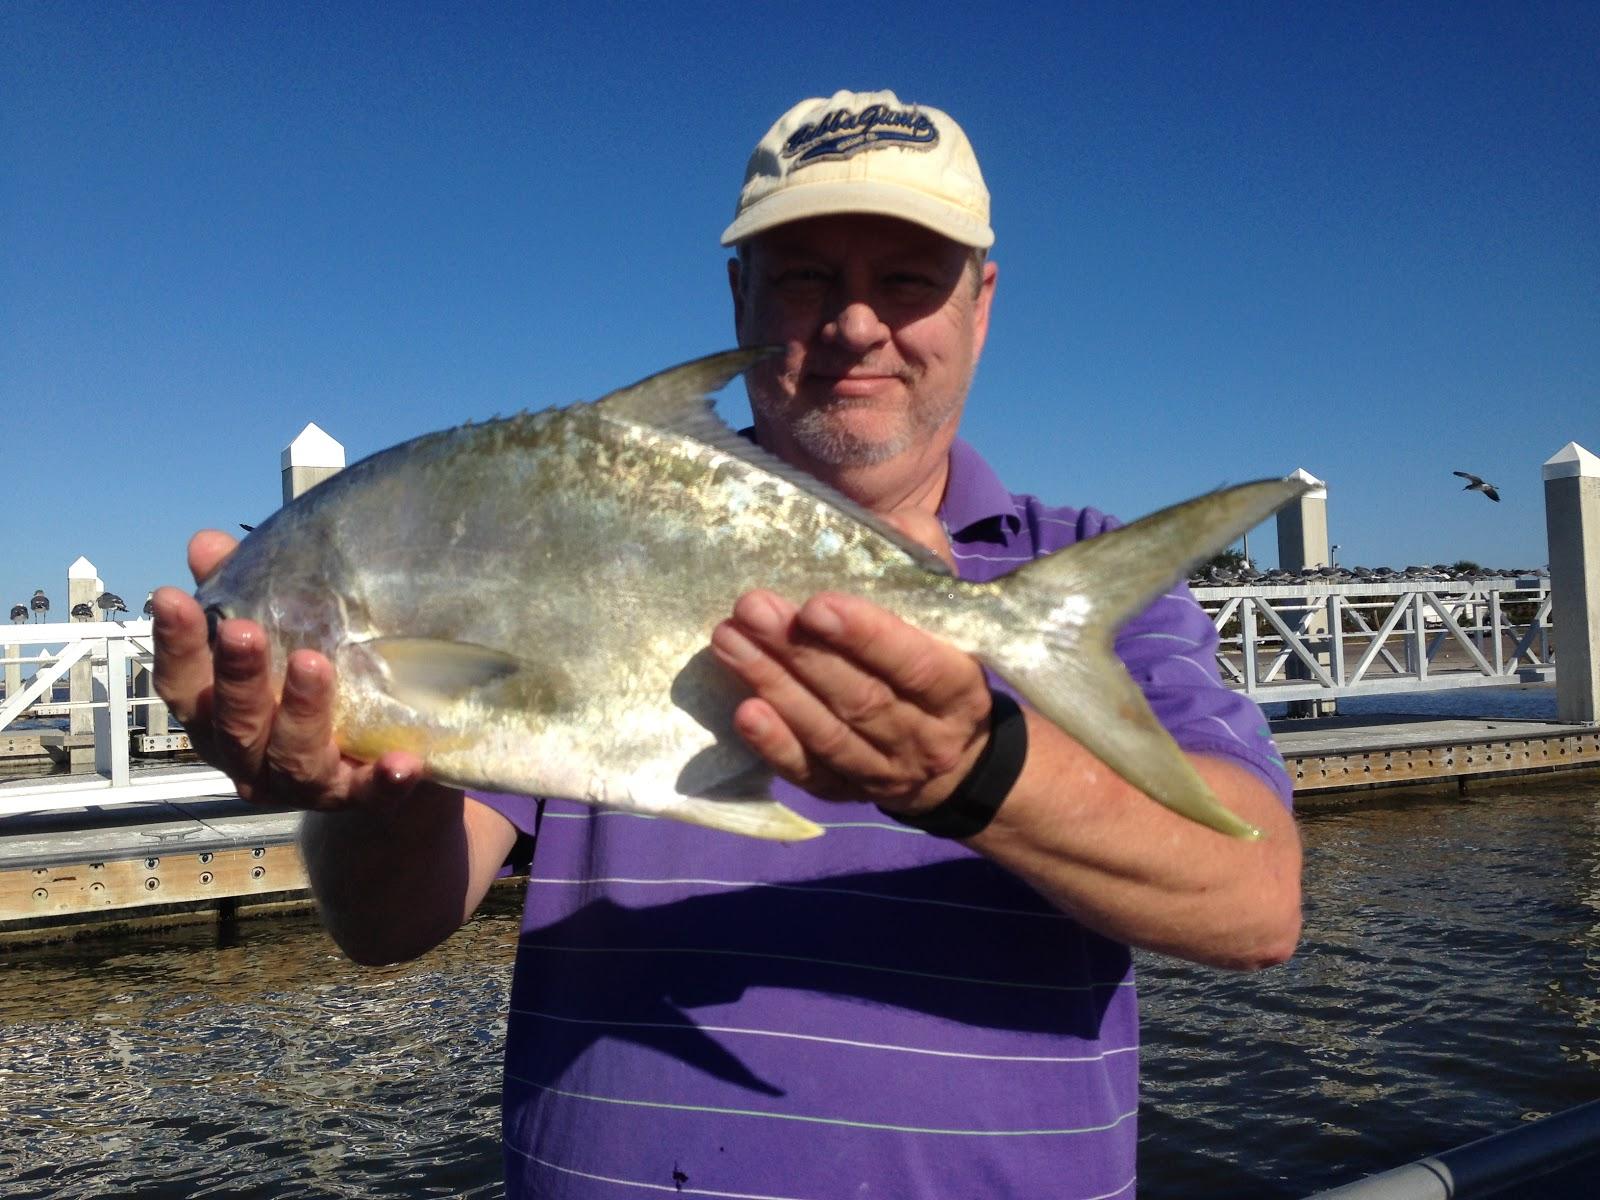 Capt dave sipler 39 s sport fishing 11 10 november pompano for Captain dave s fishing